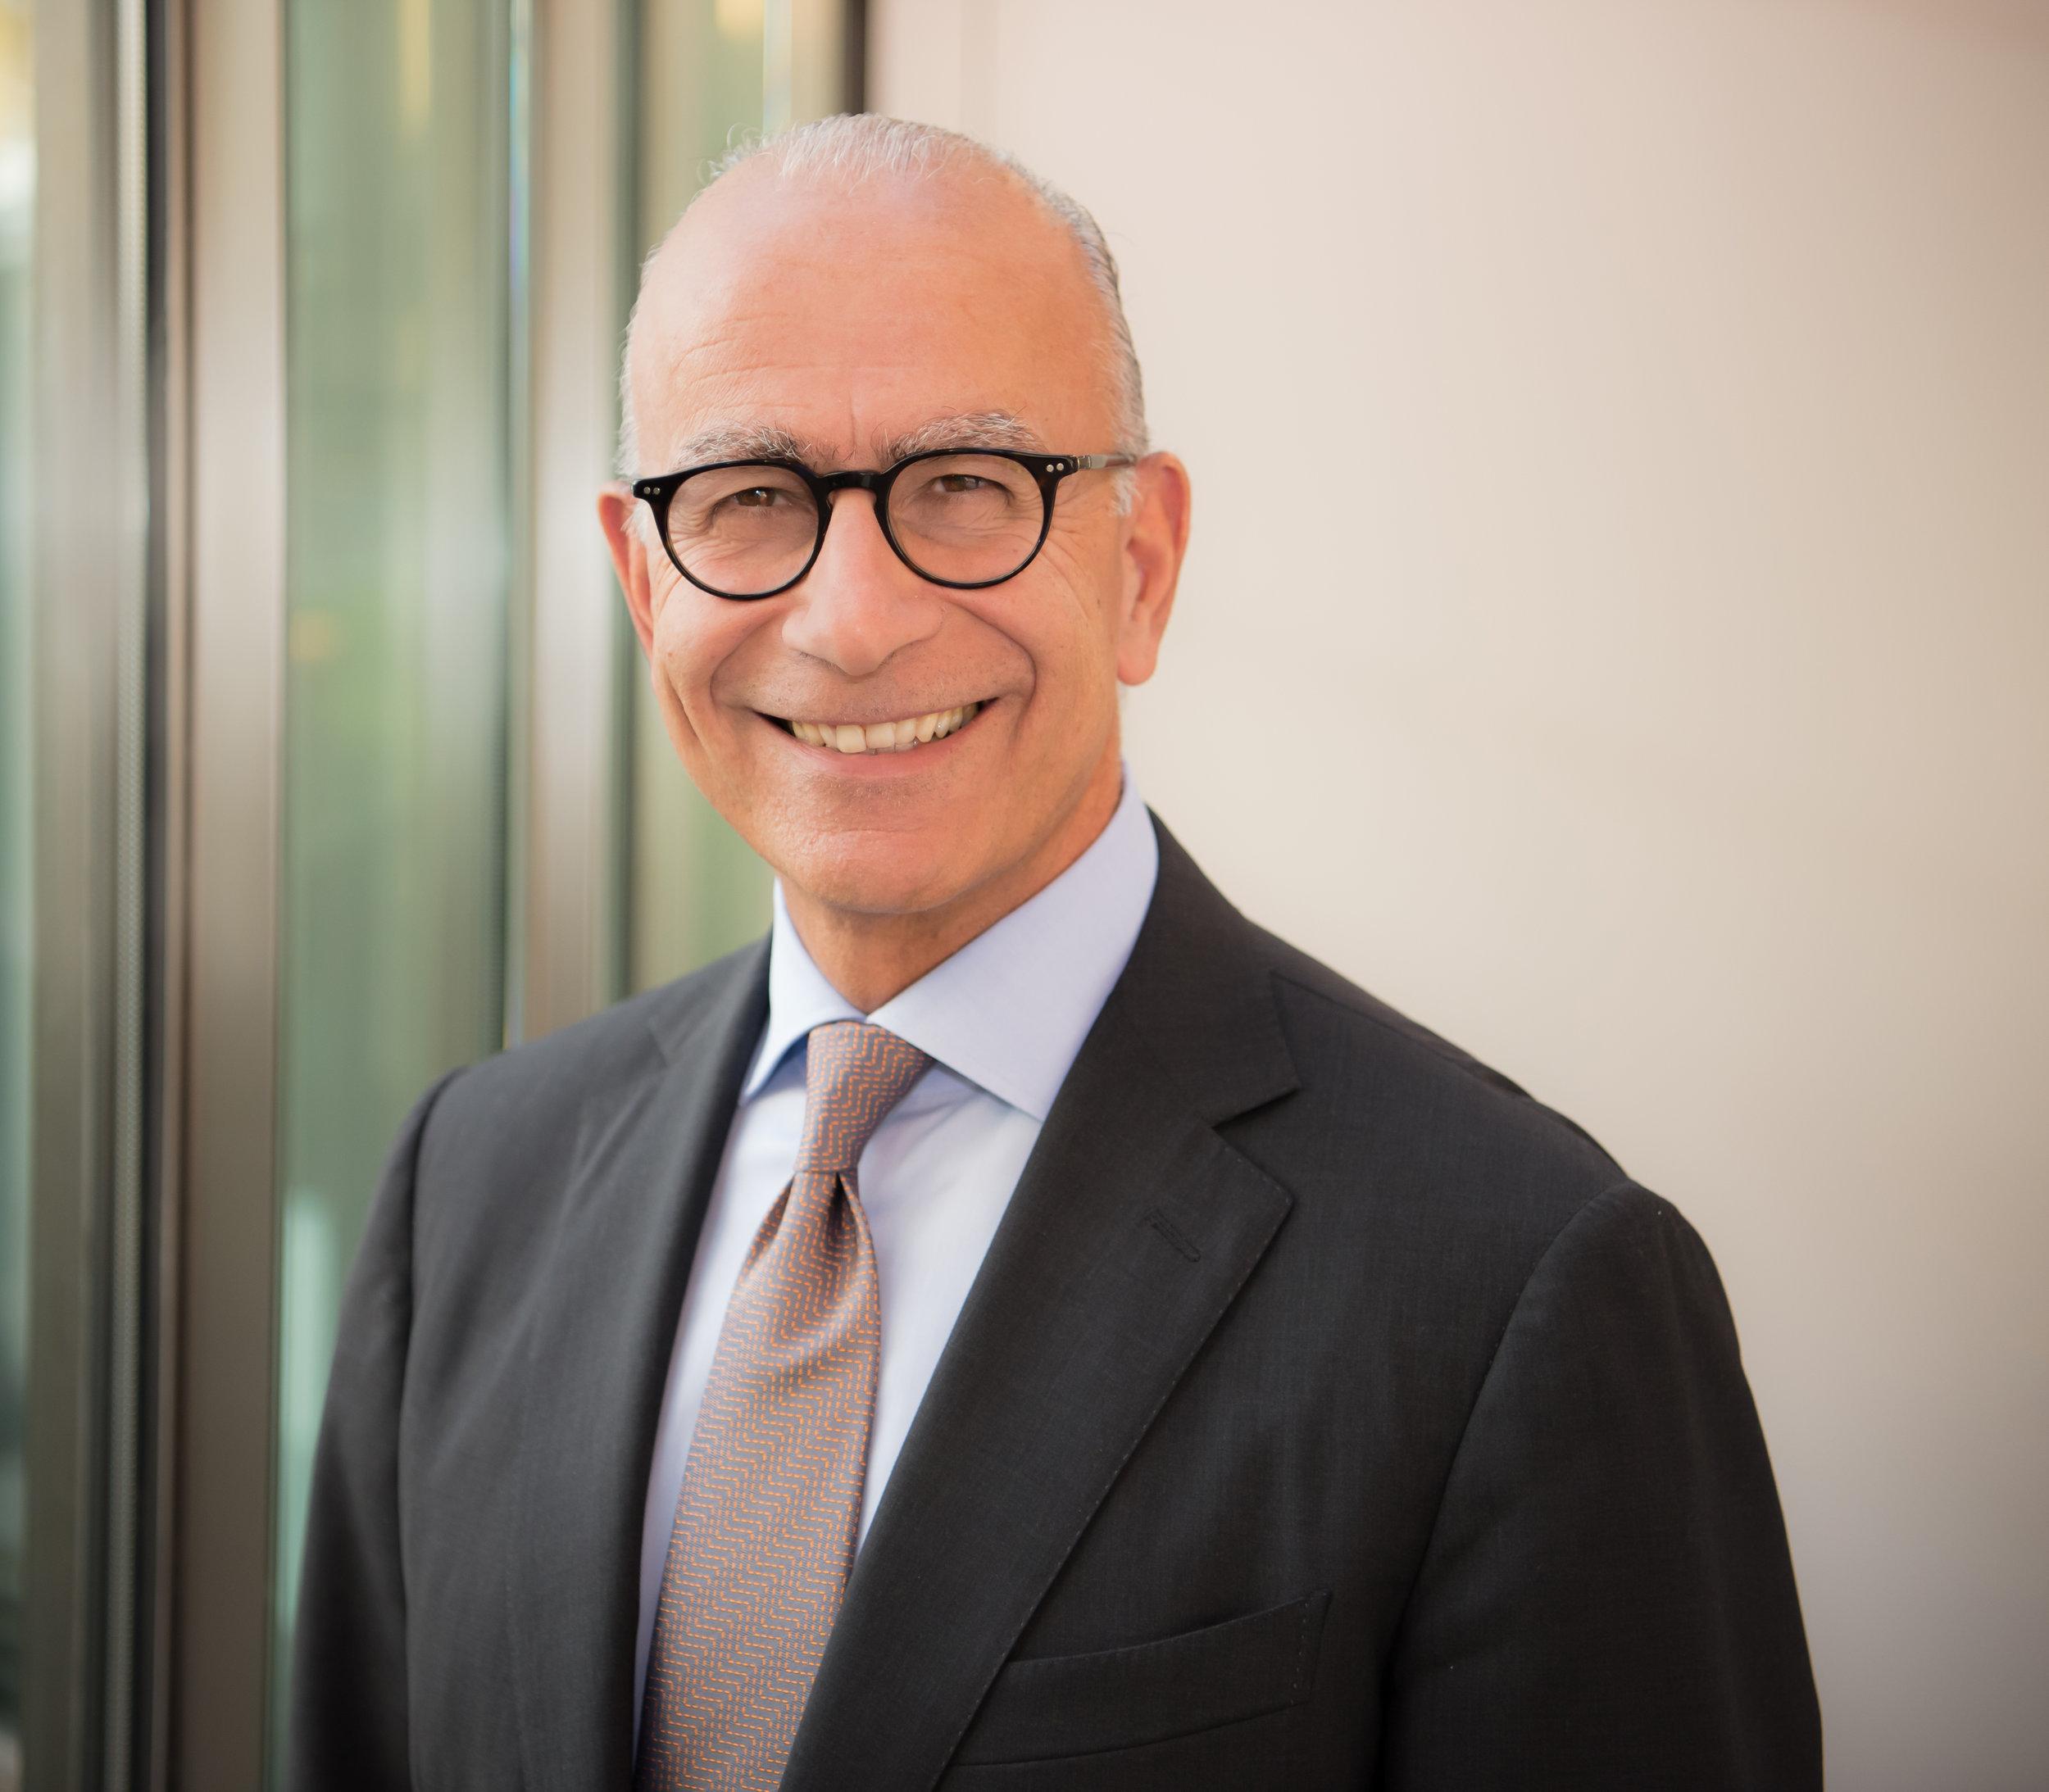 ROBERT JEANBART, CEO of SIX FINANCIAL INFORMATION